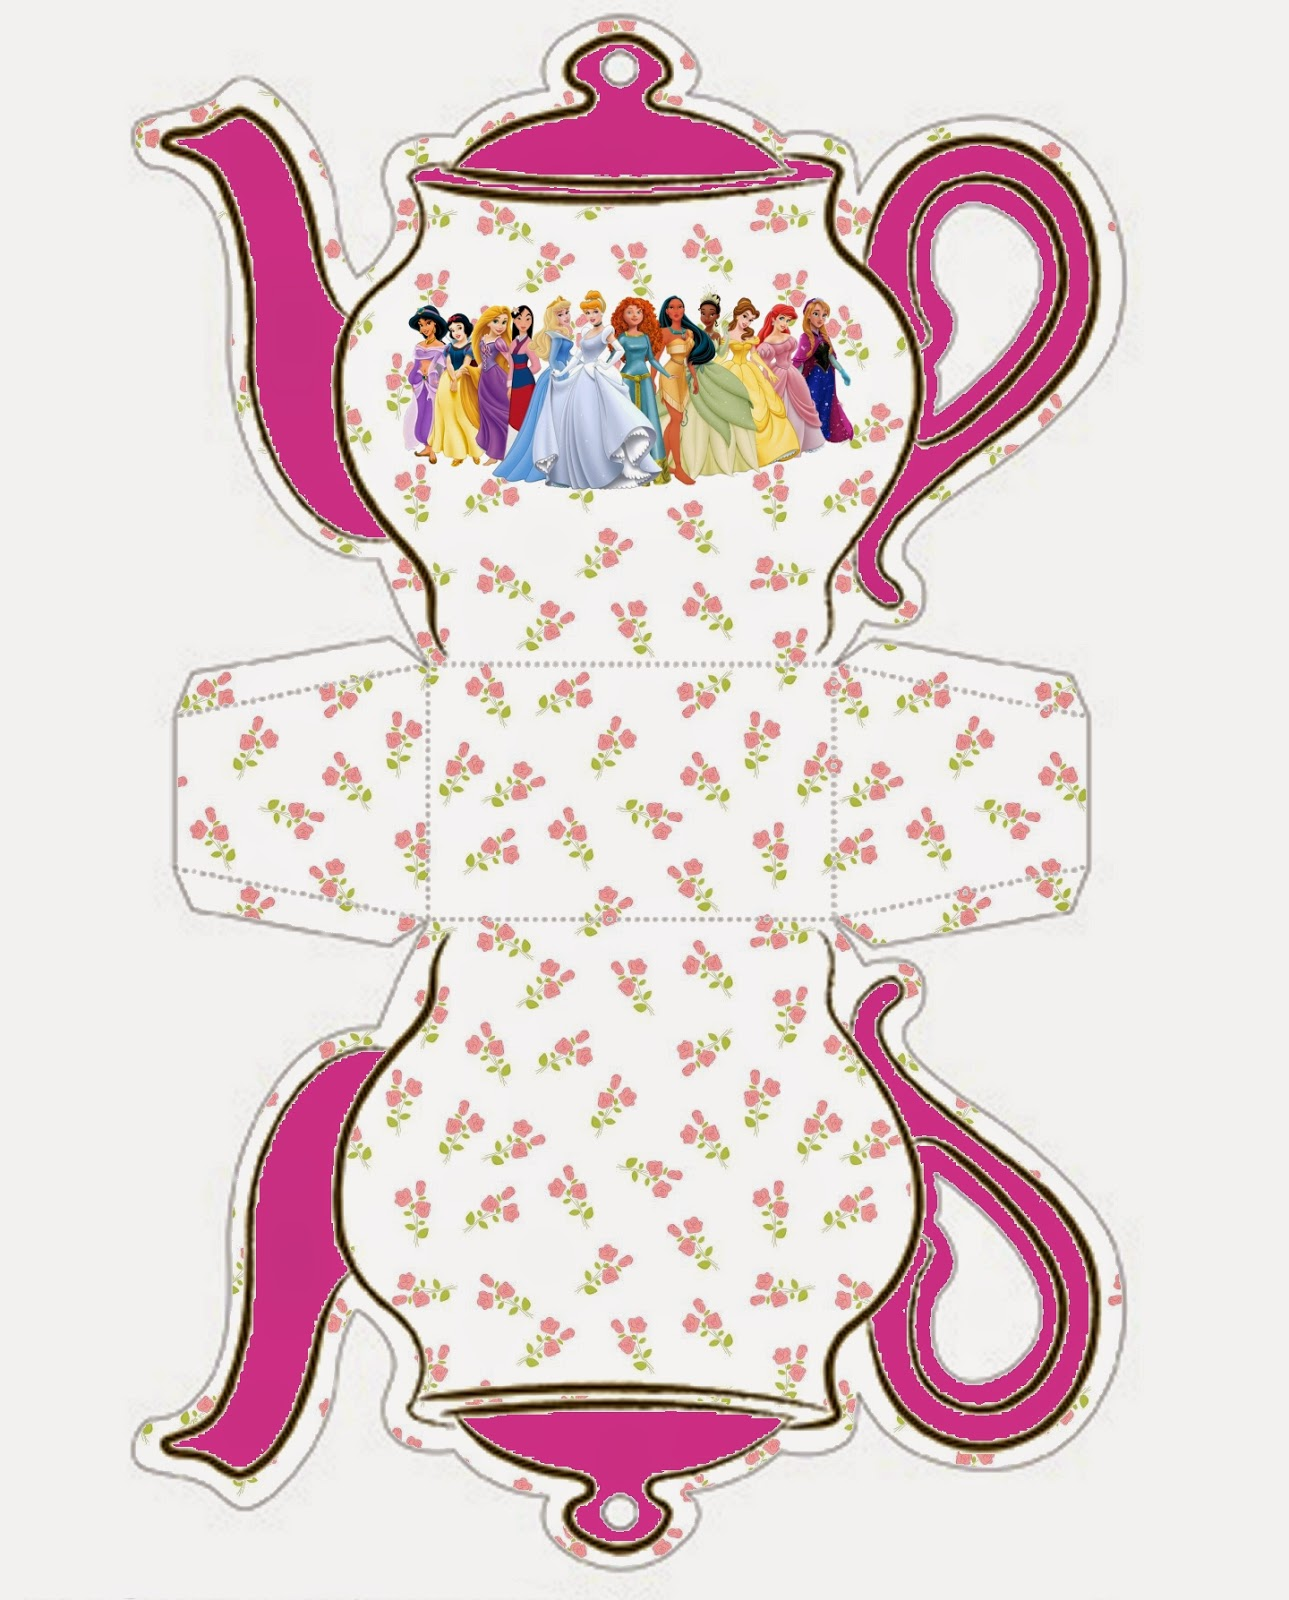 photo regarding Teapot Printable referred to as Disney Princess: Teapot Cost-free Printable Box. - Oh My Fiesta